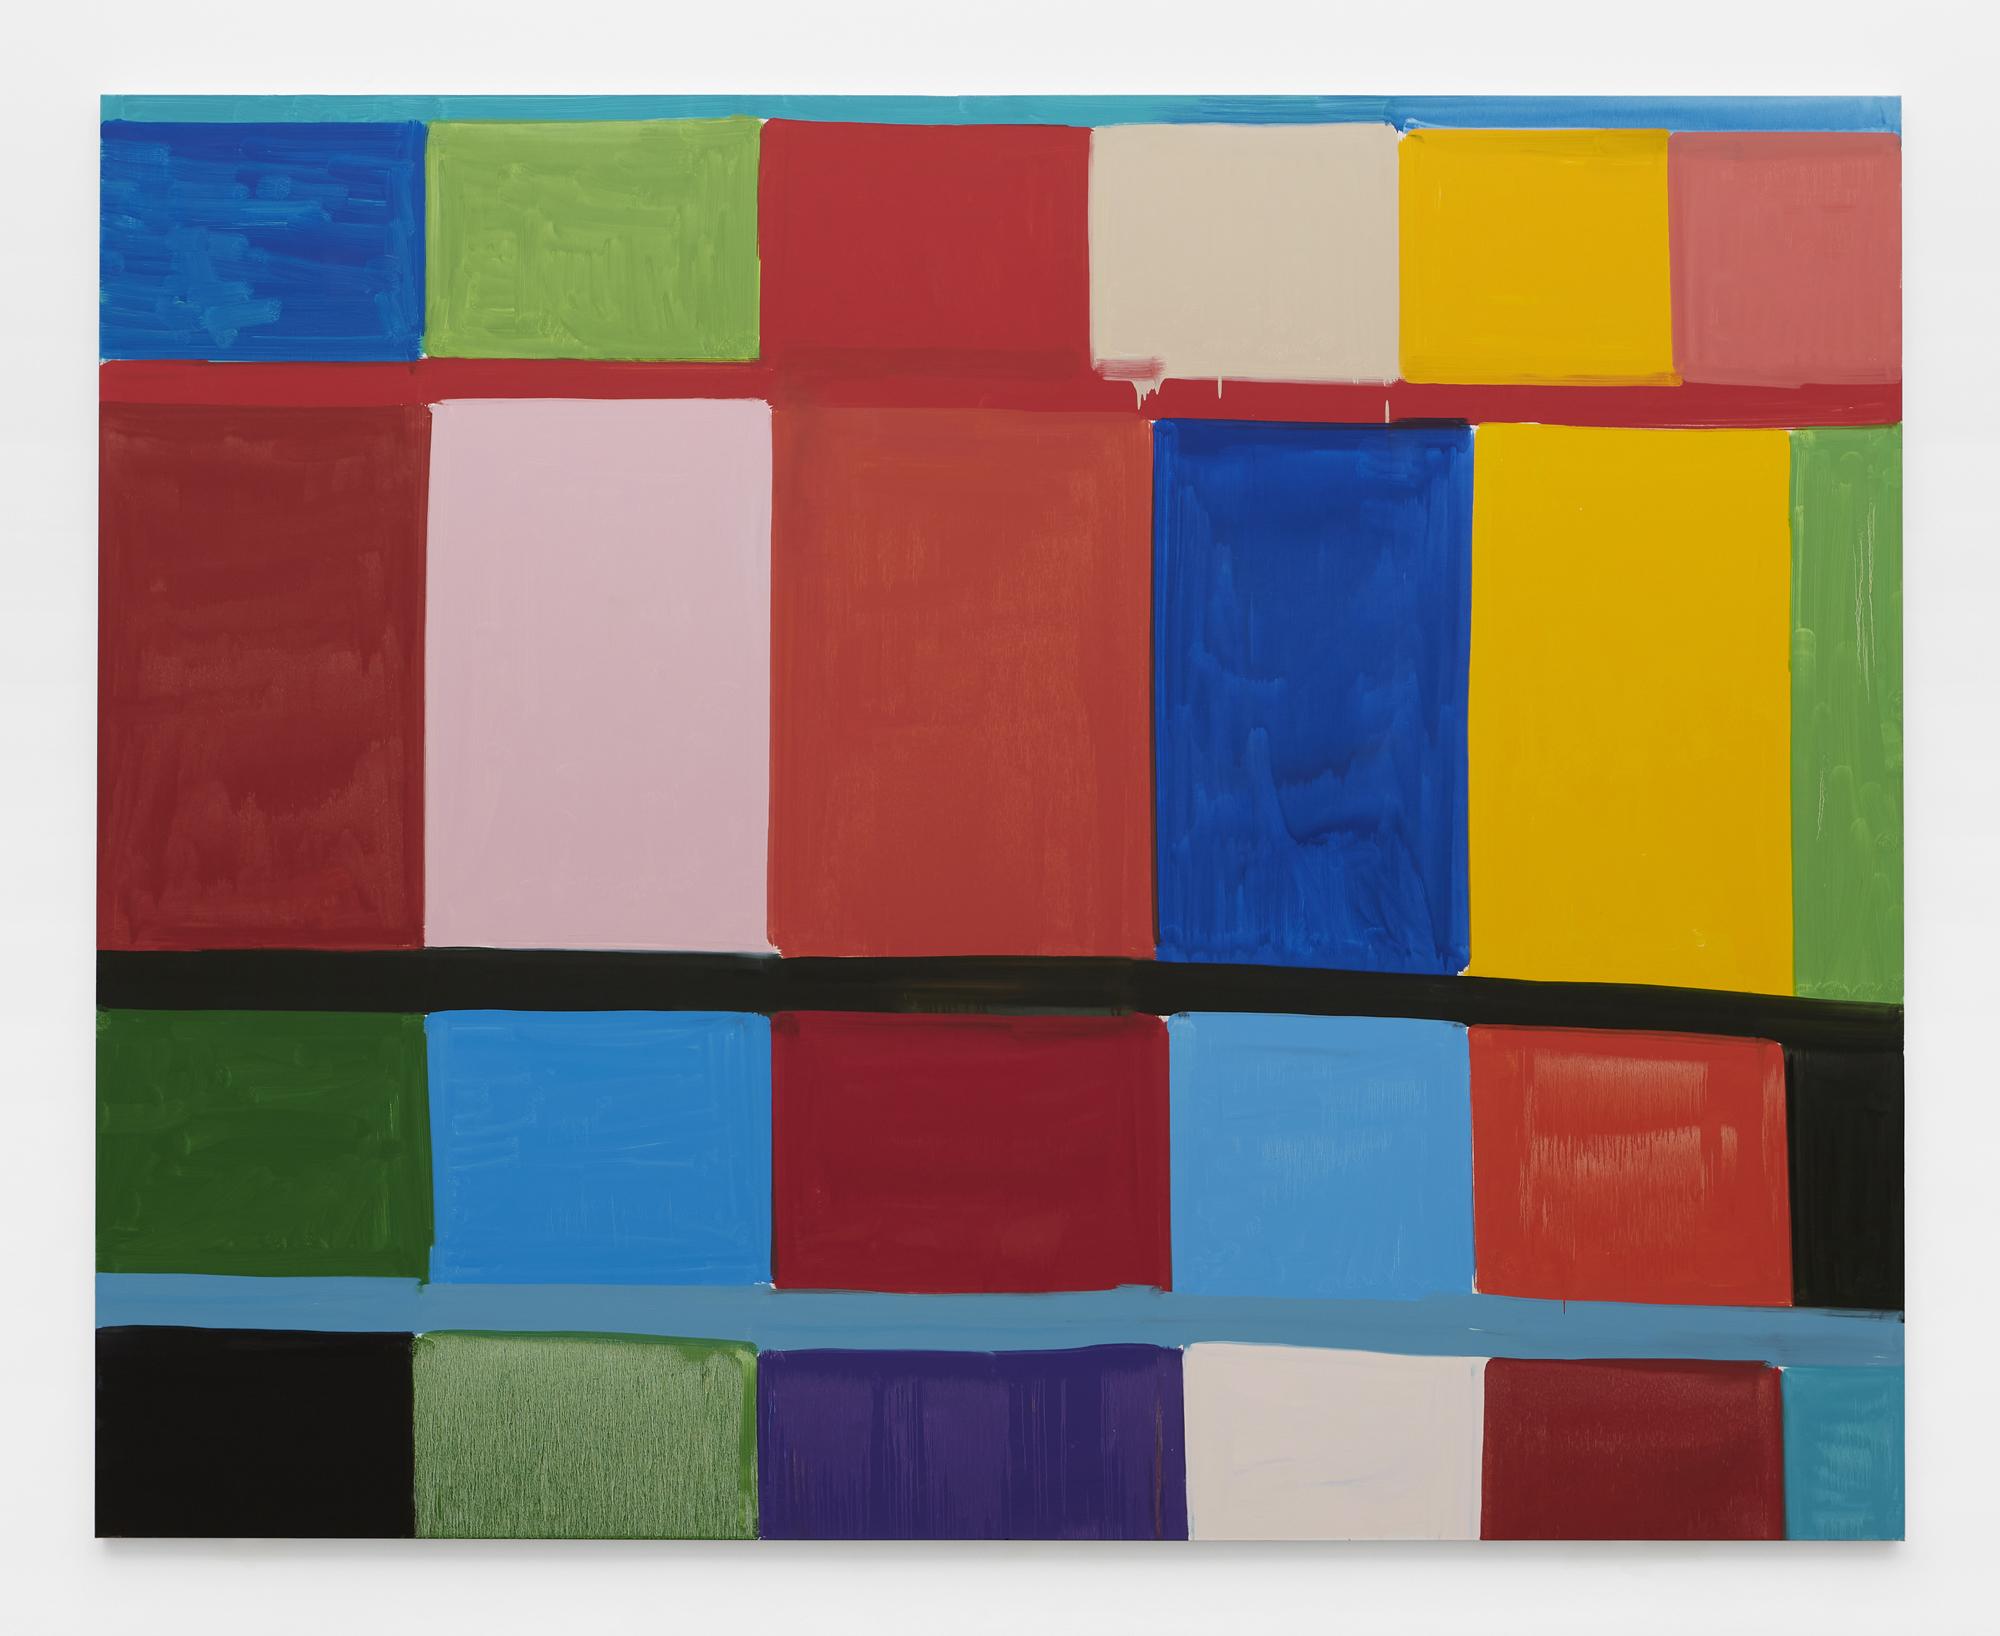 Twenty twenty, 2020 Oil on linen 96 x 120 inches 244 x 305 cm ©Stanley Whitney, Courtesy Matthew Marks Gallery